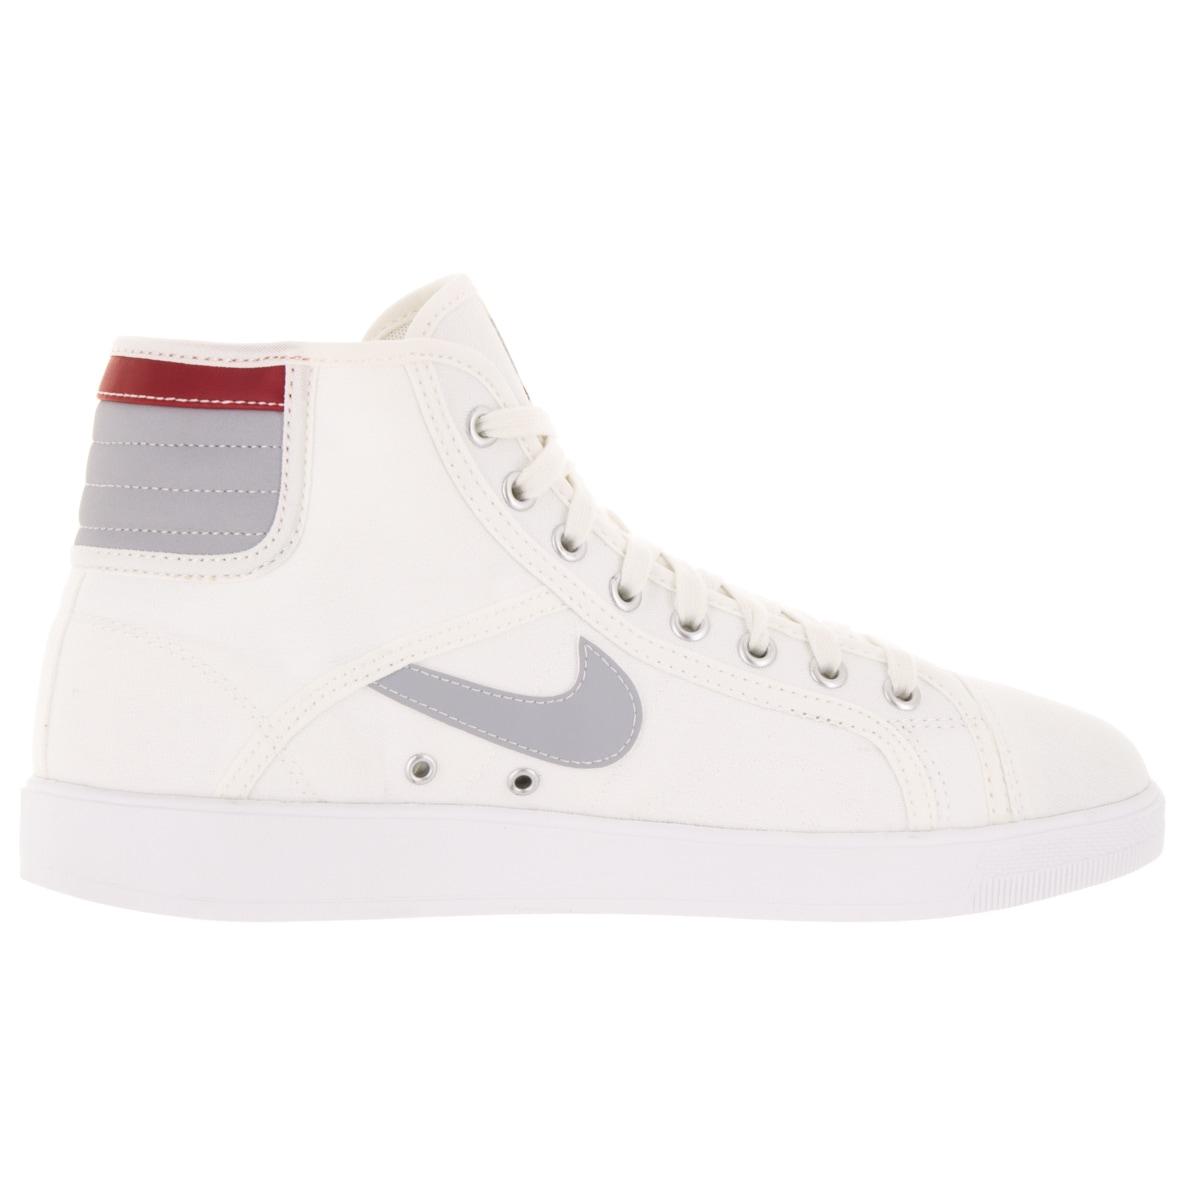 6195b9217df3 Shop Nike Jordan Men s Air Jordan Skyhigh Og Sail Gym Red Wolf Grey Casual  Shoe - Free Shipping Today - Overstock - 12318231